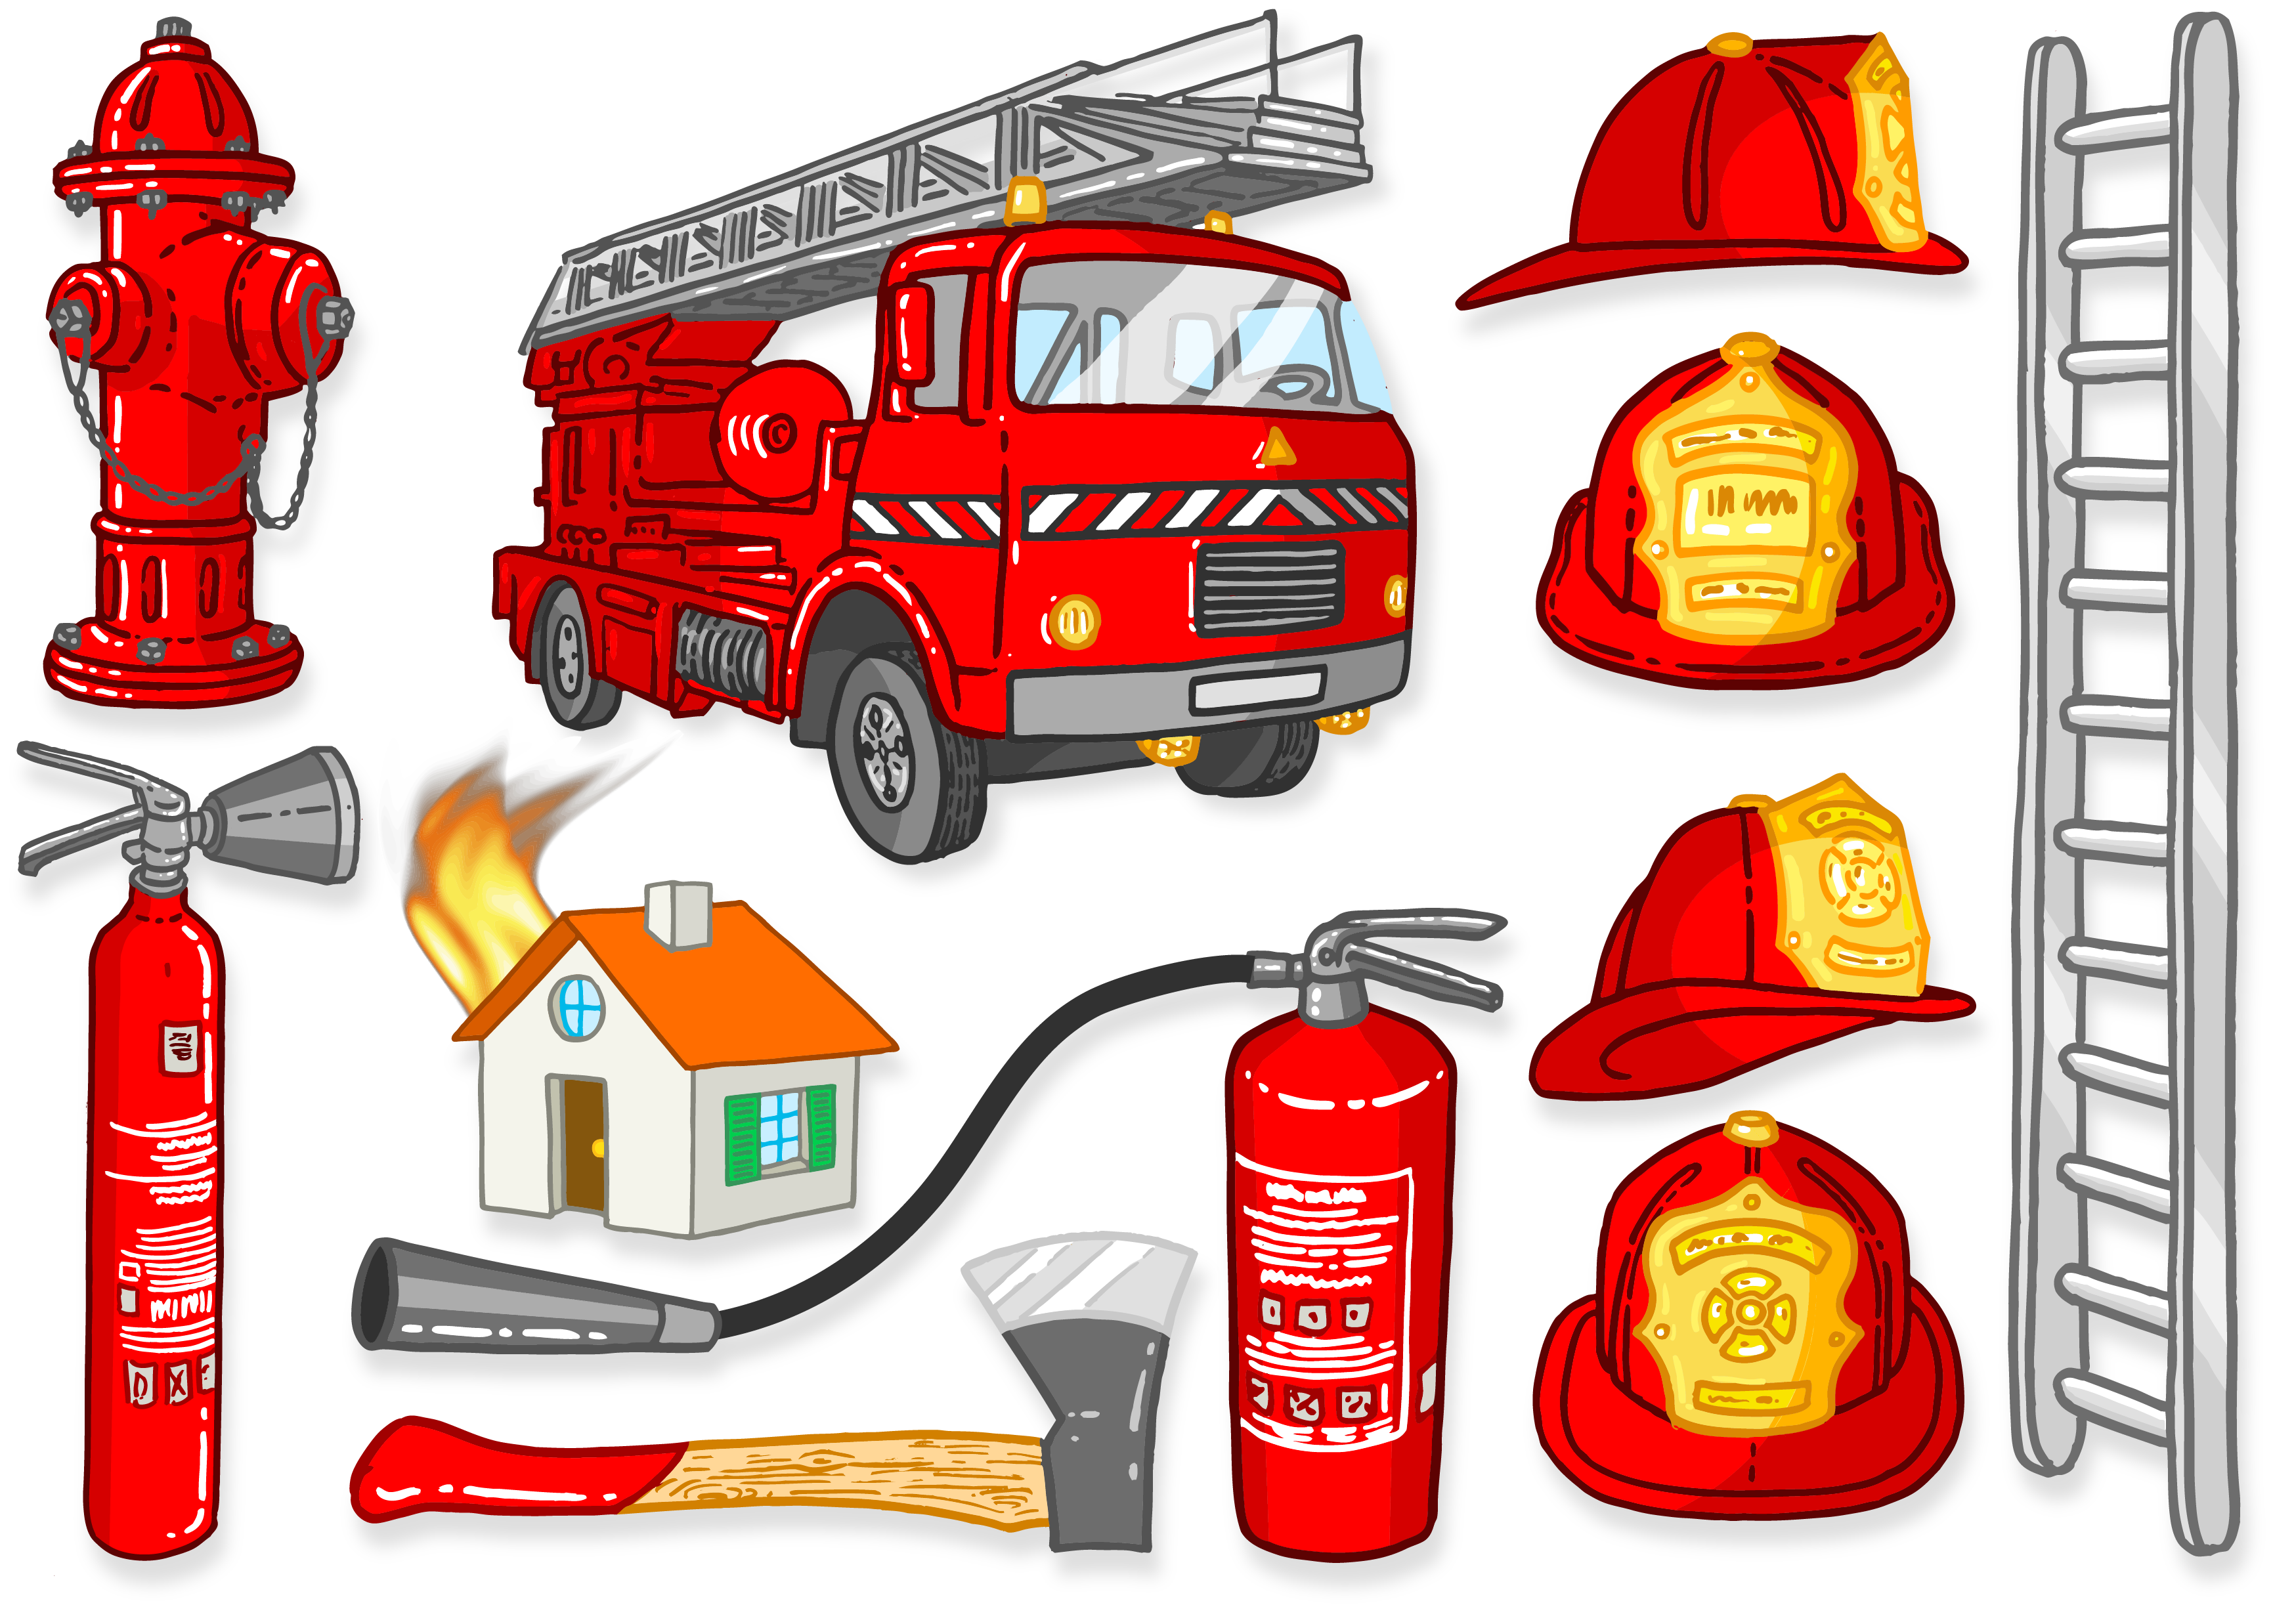 Gear clipart automotive tool. Firefighter firefighting fire engine